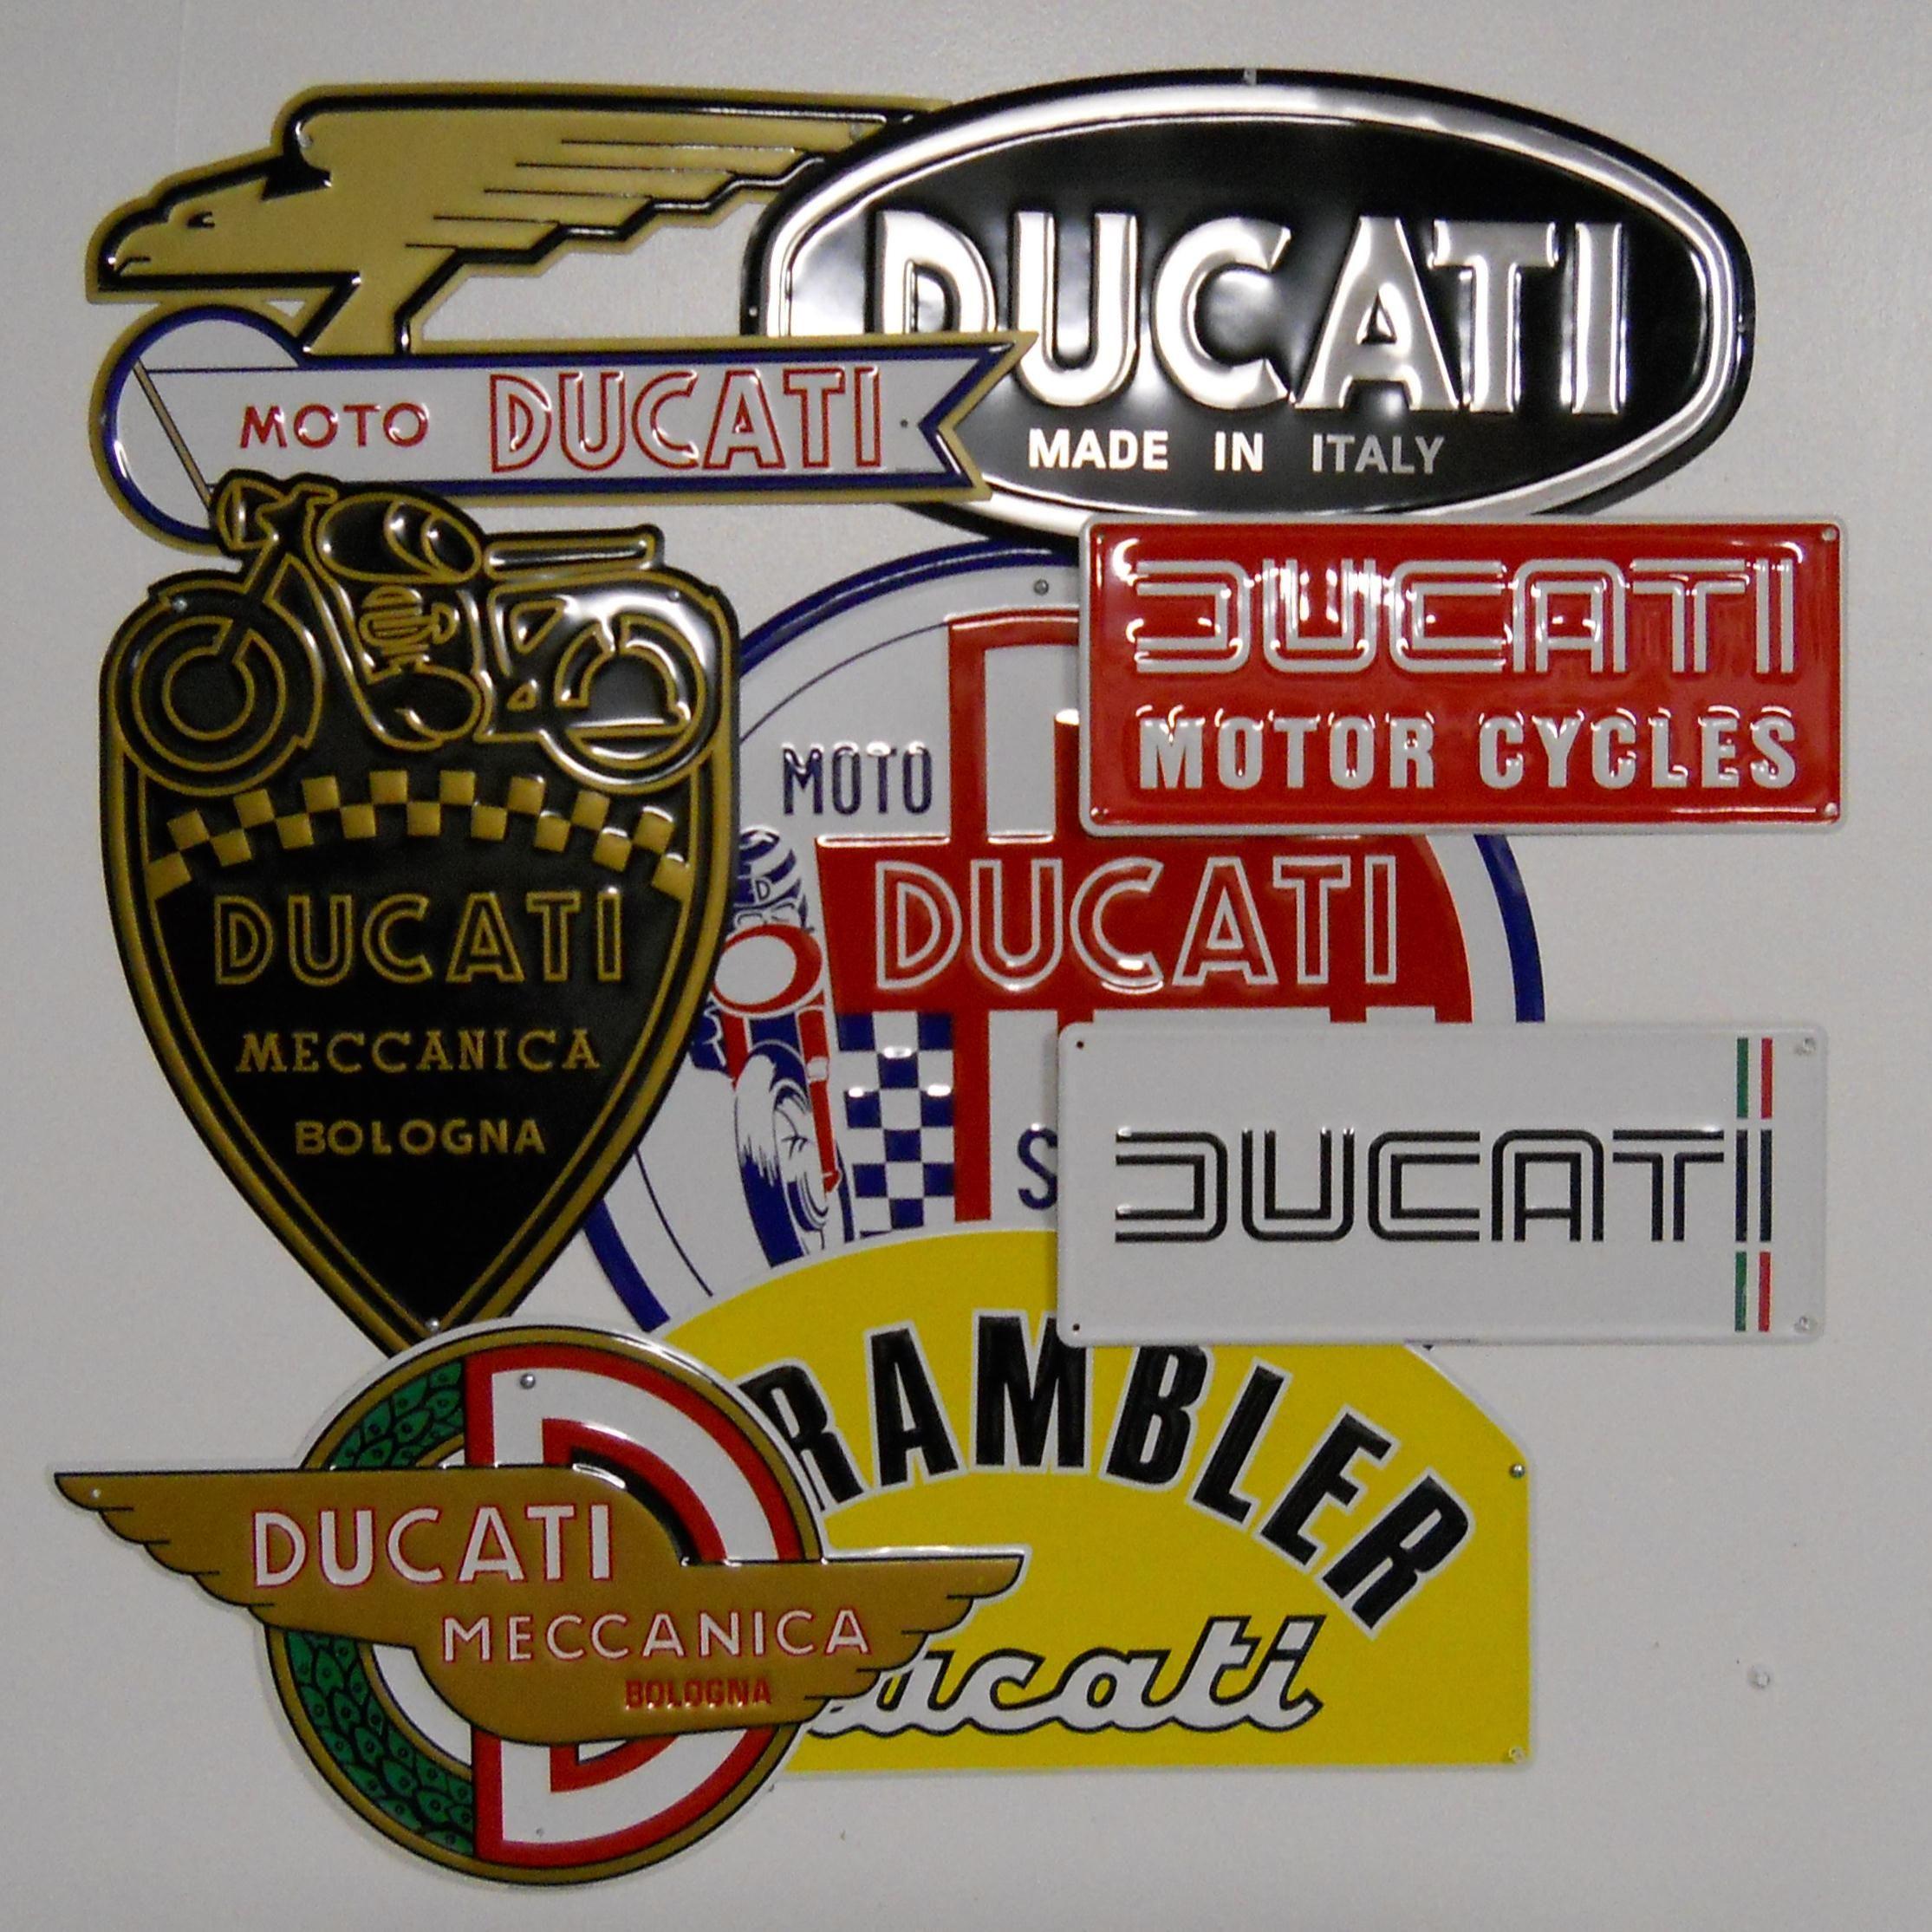 Ducati Signs Motorcycle Signs Ducati Motorcycles Ducati